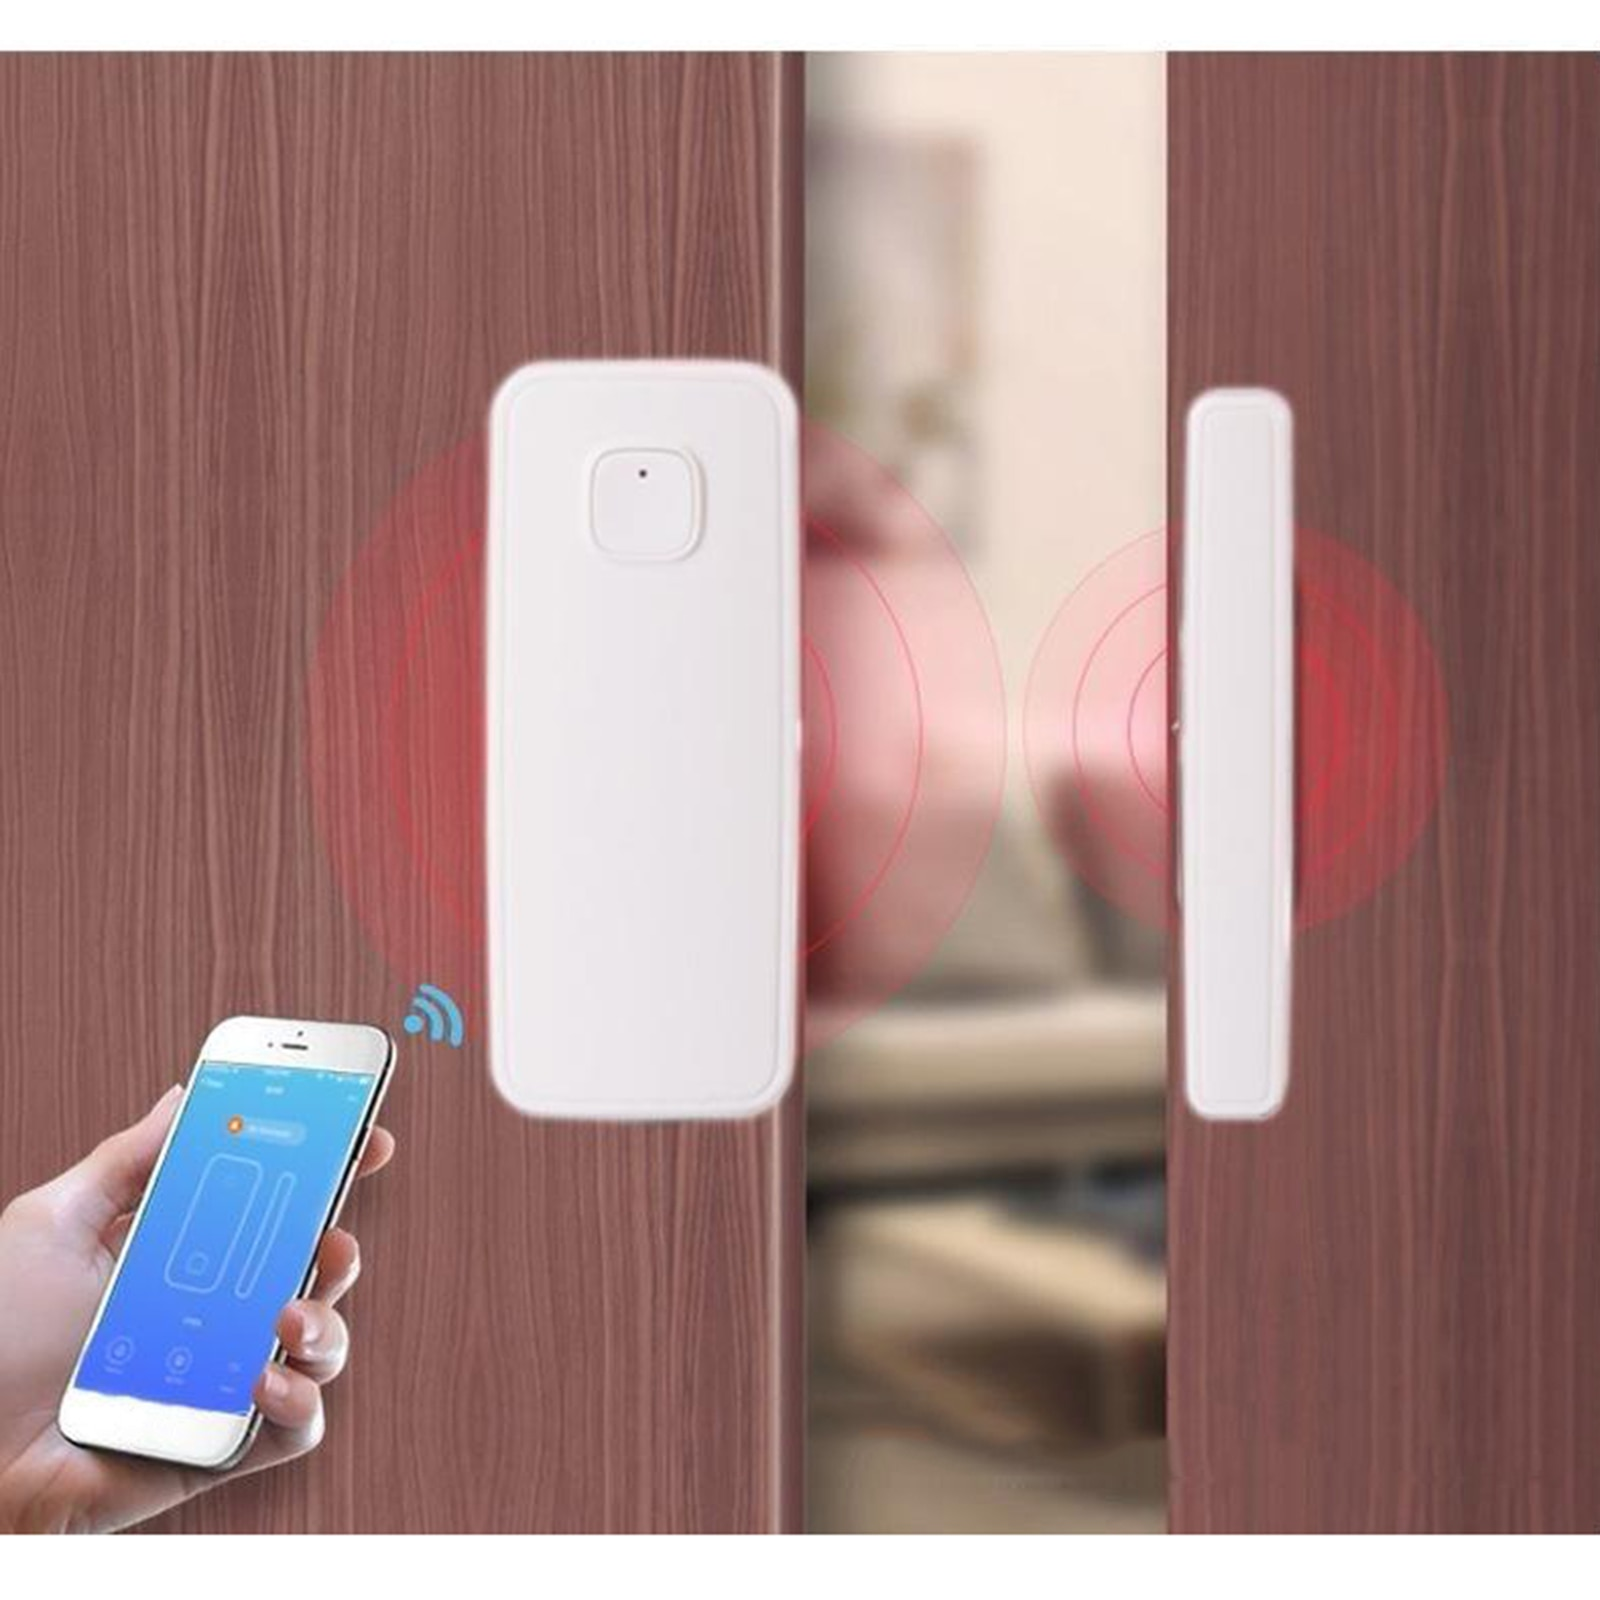 WiFi Tür Windows Sensor Smart Telefon APP Control Tür Status Magnetische Detektor Wireless Security Alarm für Home Bussiness Alarm